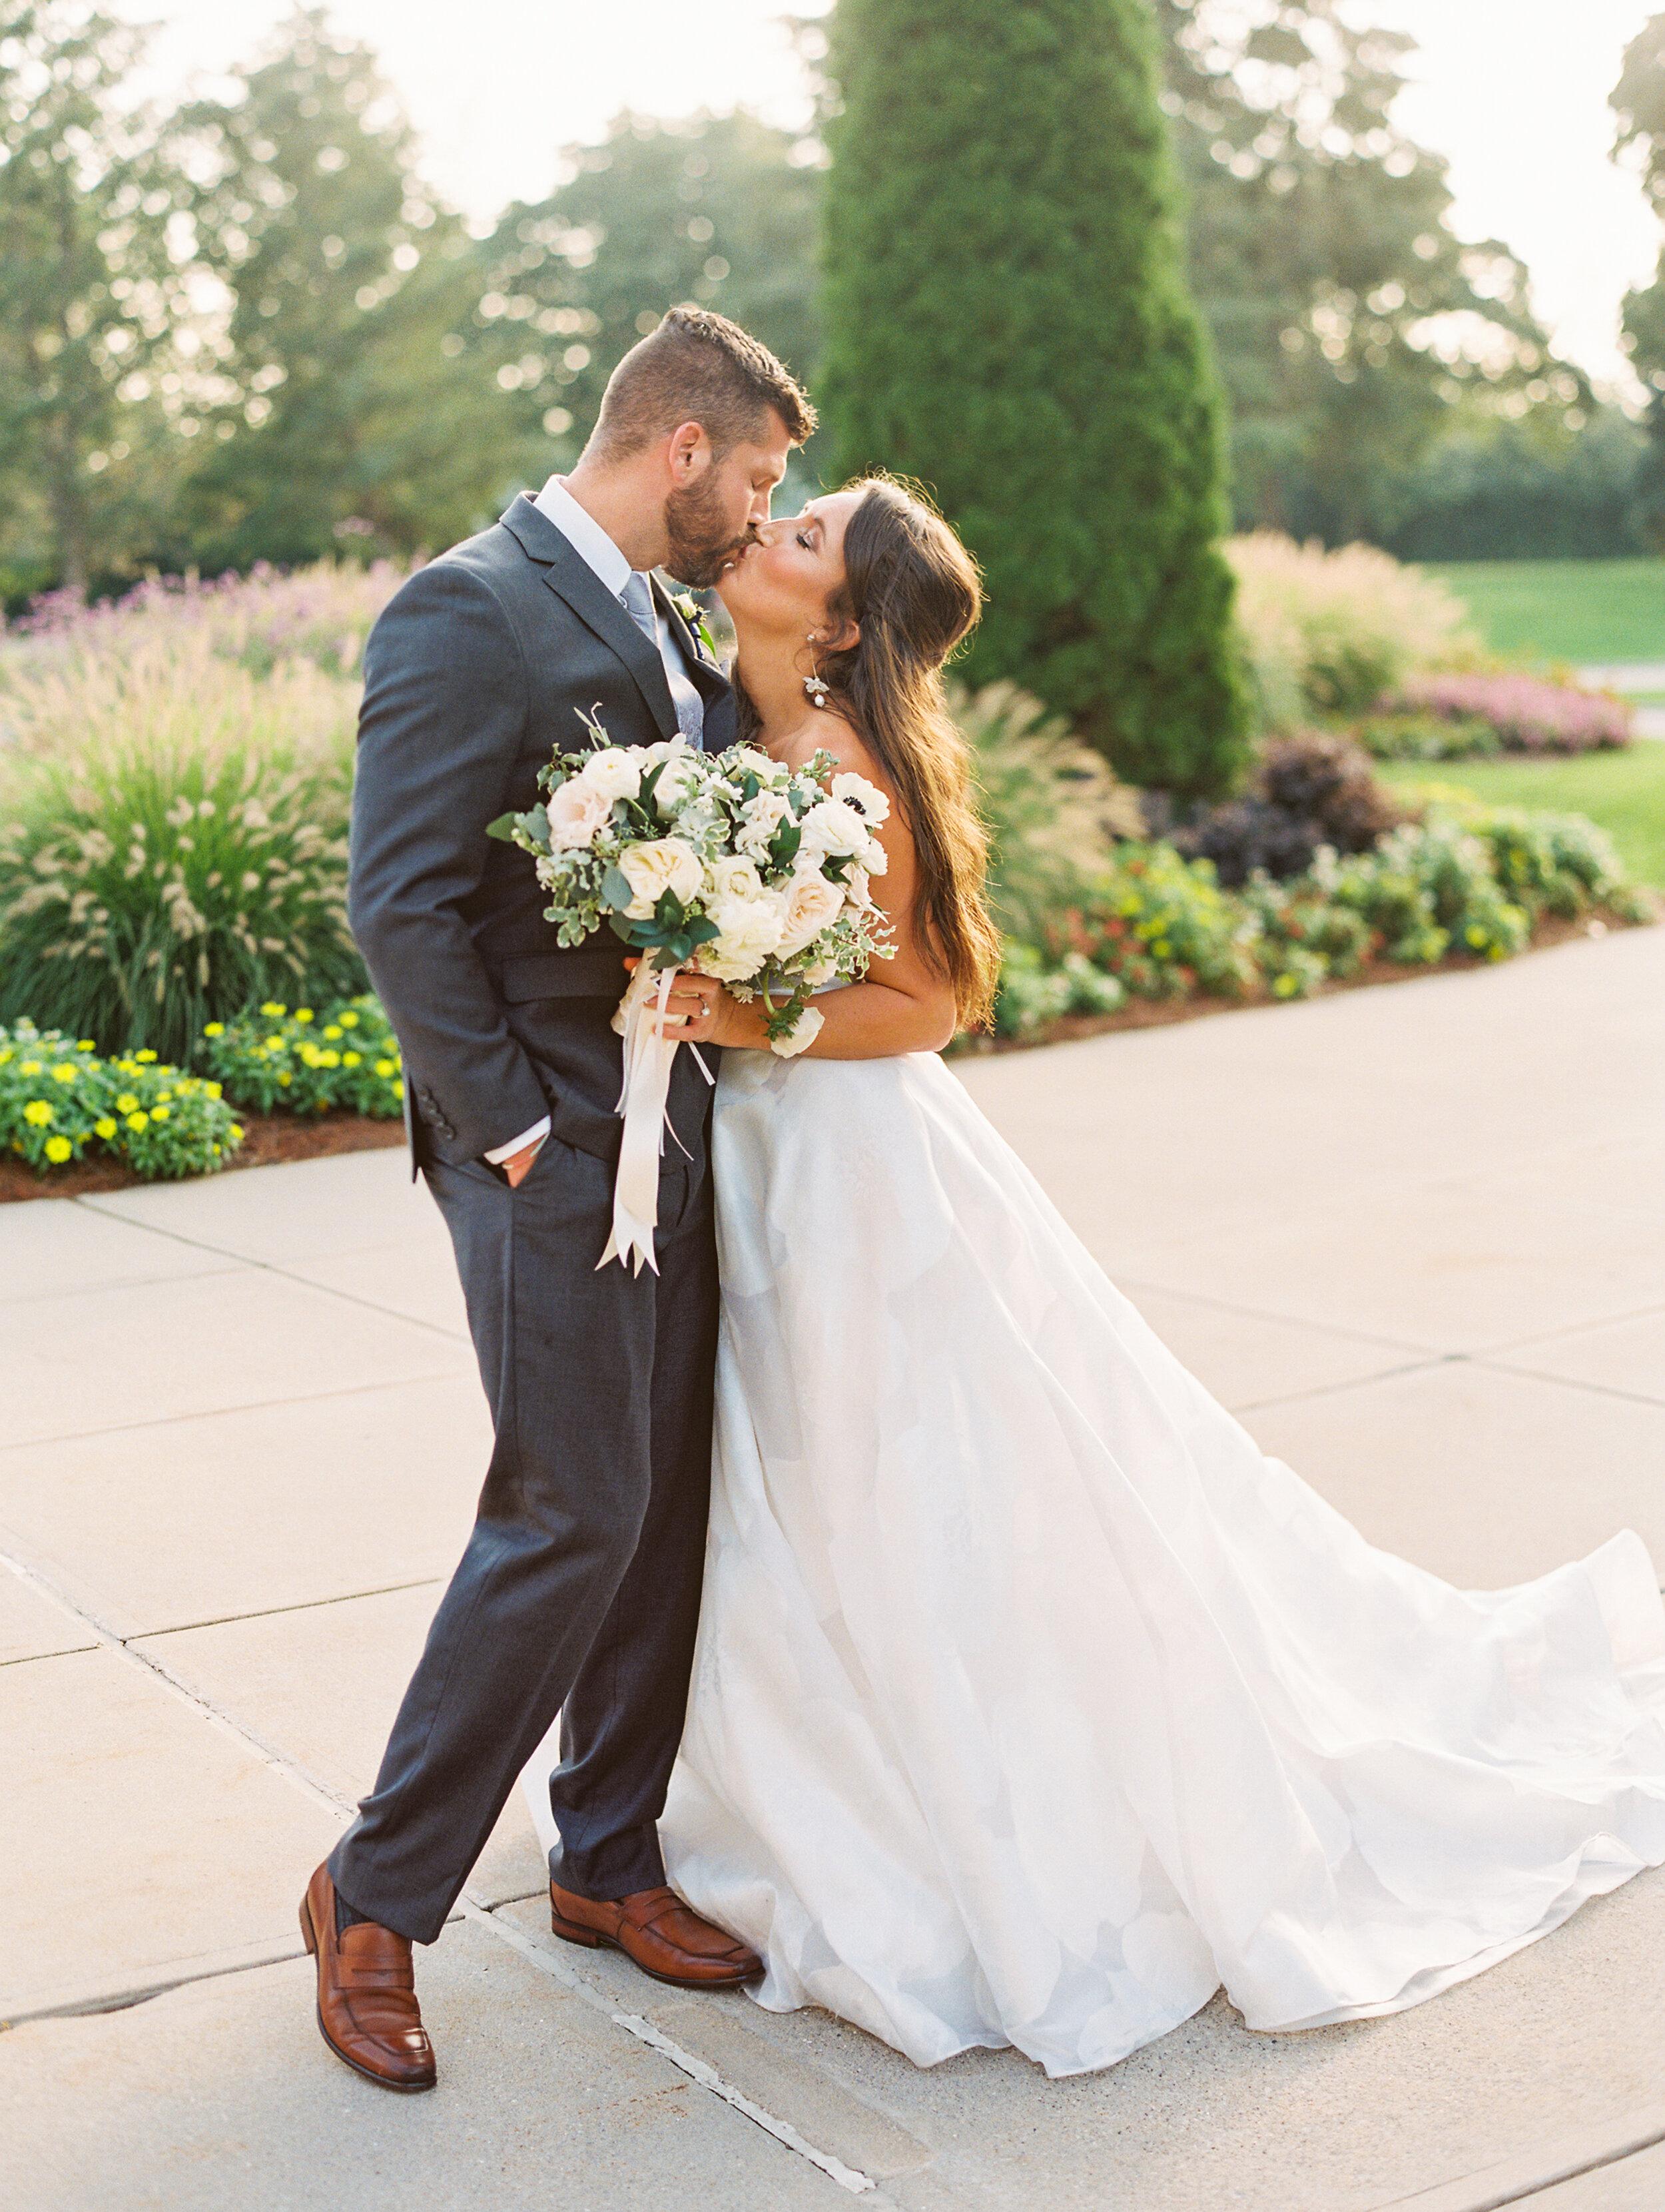 Kuiper+Wedding+Reception+Bridal+Party-166.jpg